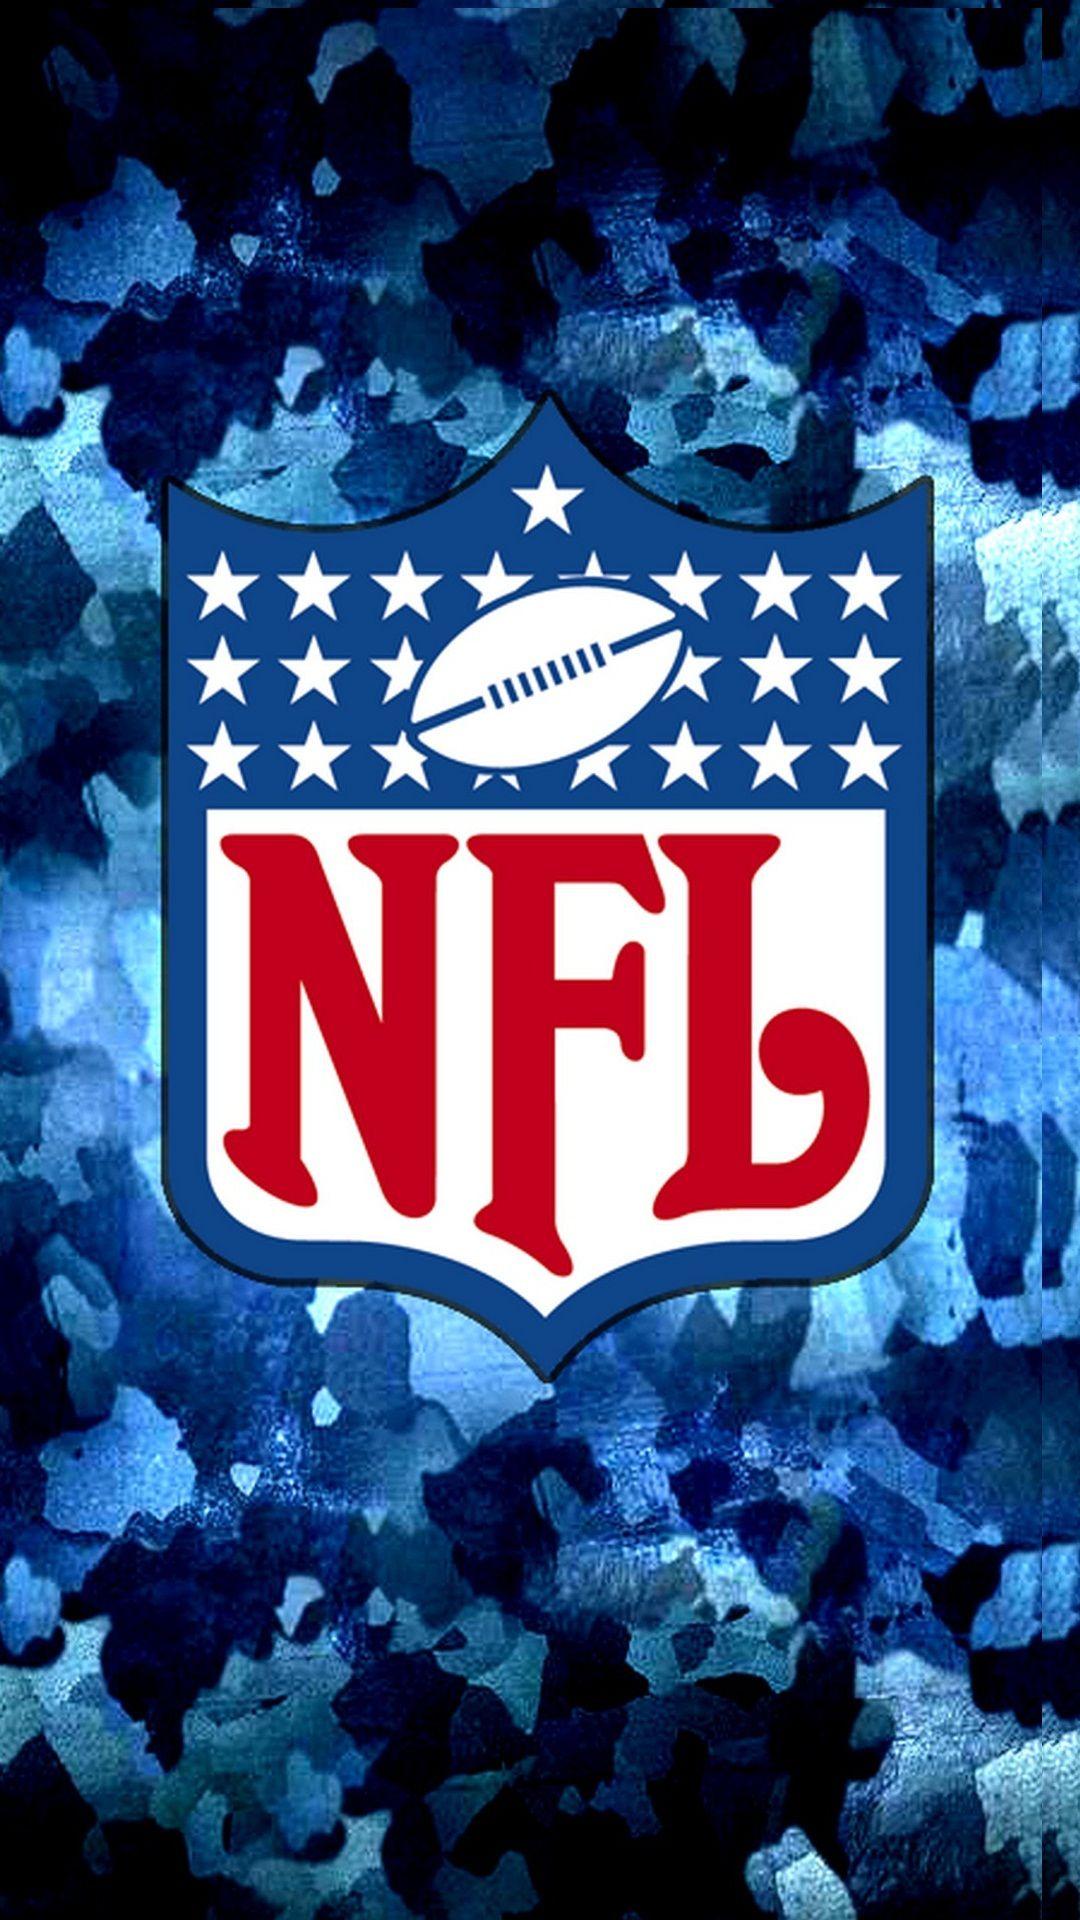 Nfl Wallpapers Nfl Football Wallpaper Nfl Nfl Logo